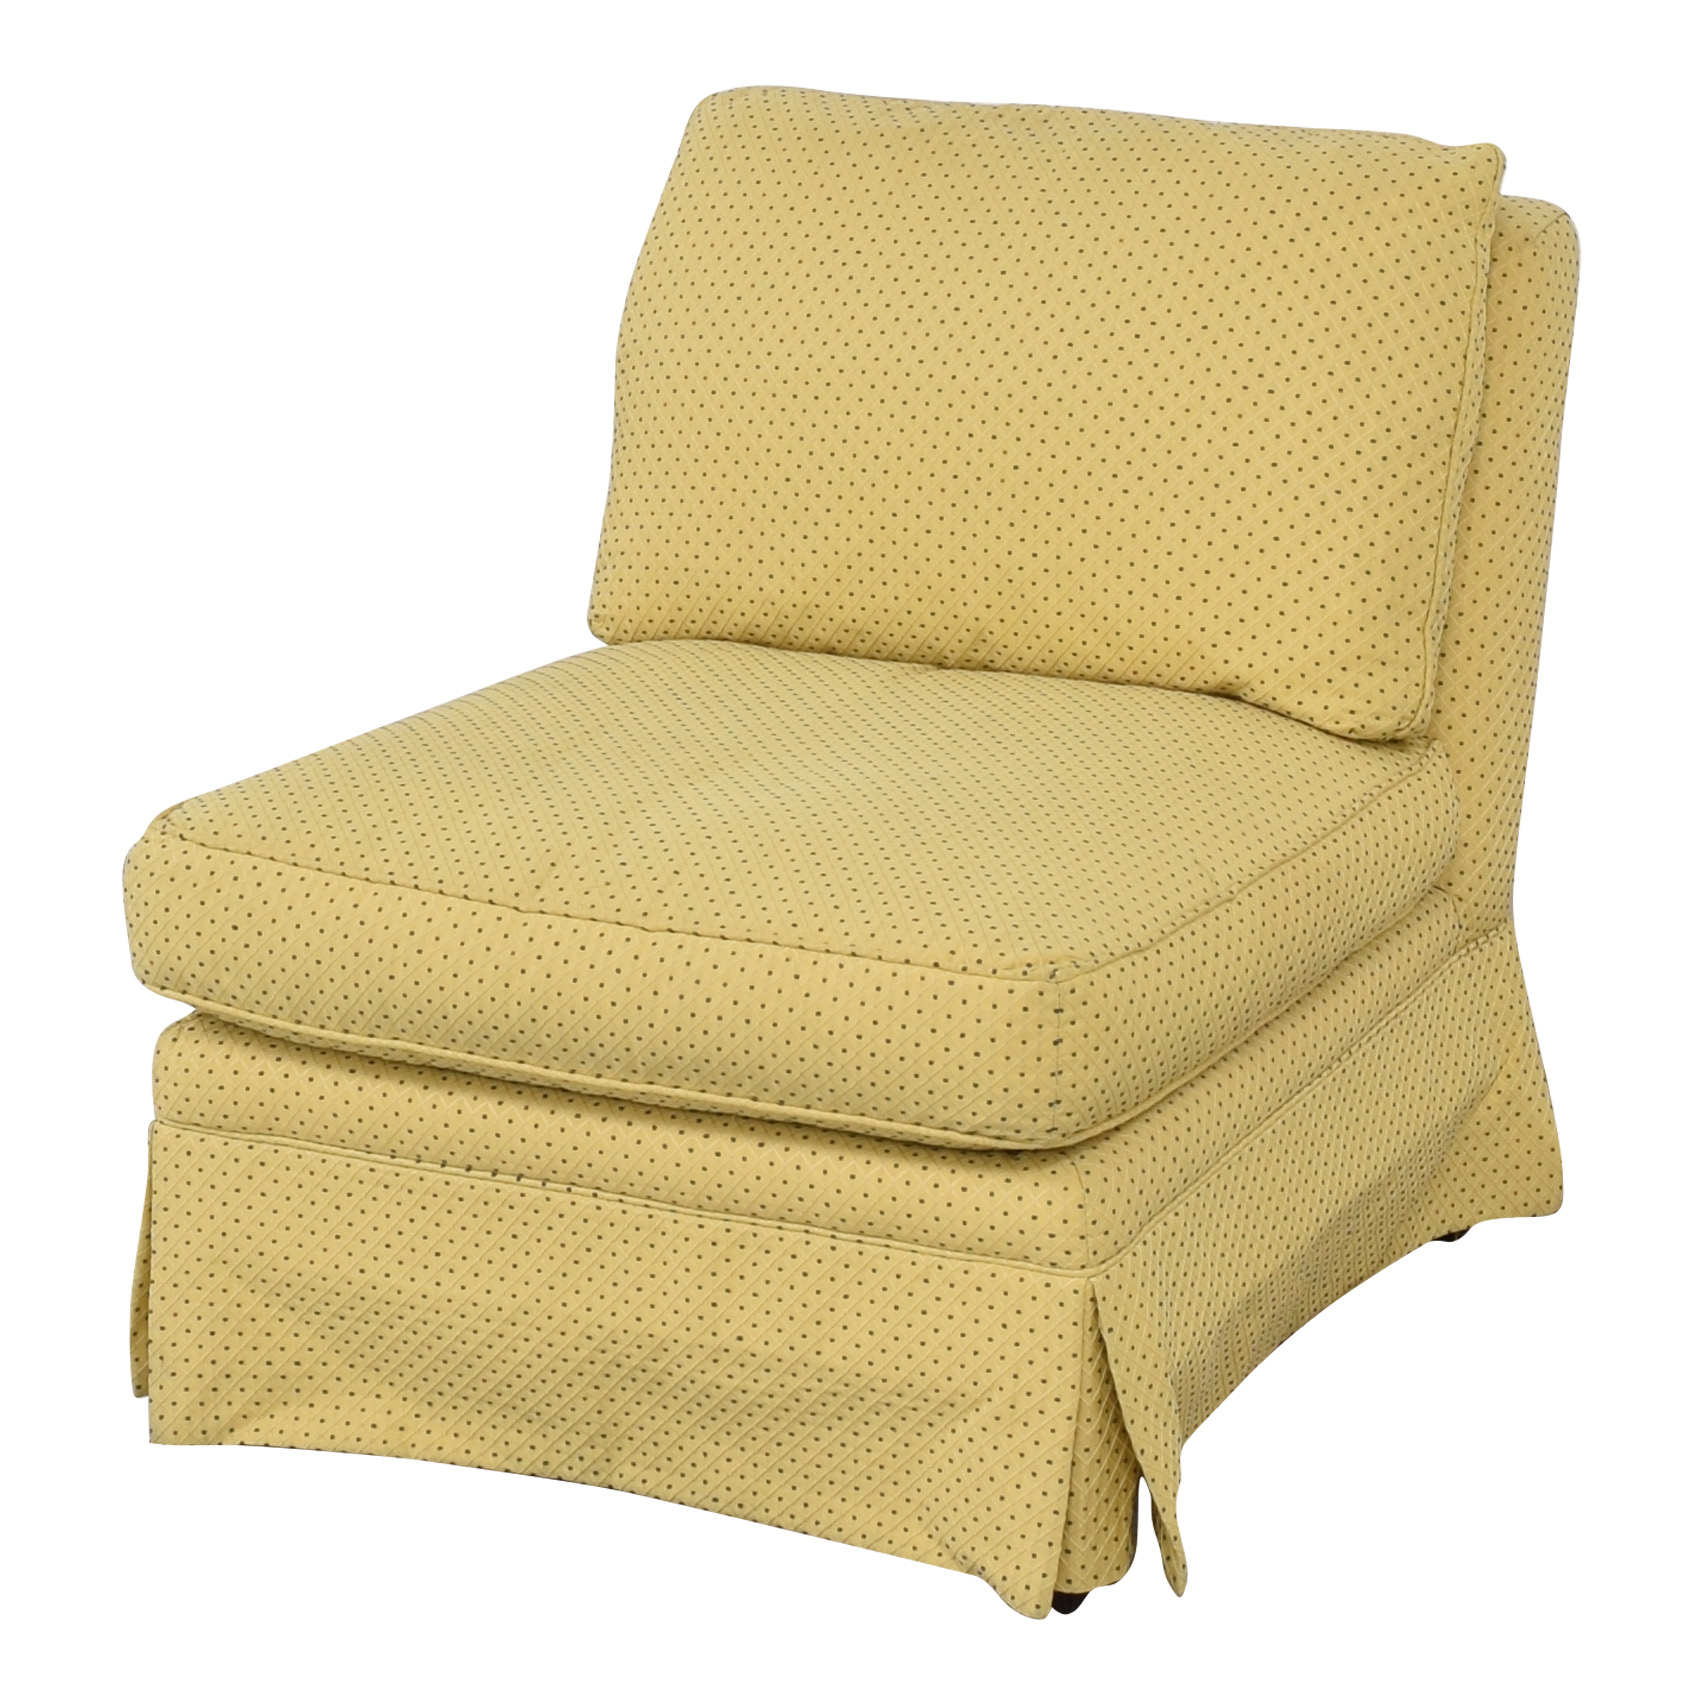 Sherrill Furniture Sherrill Furniture Upholstered Chair ct